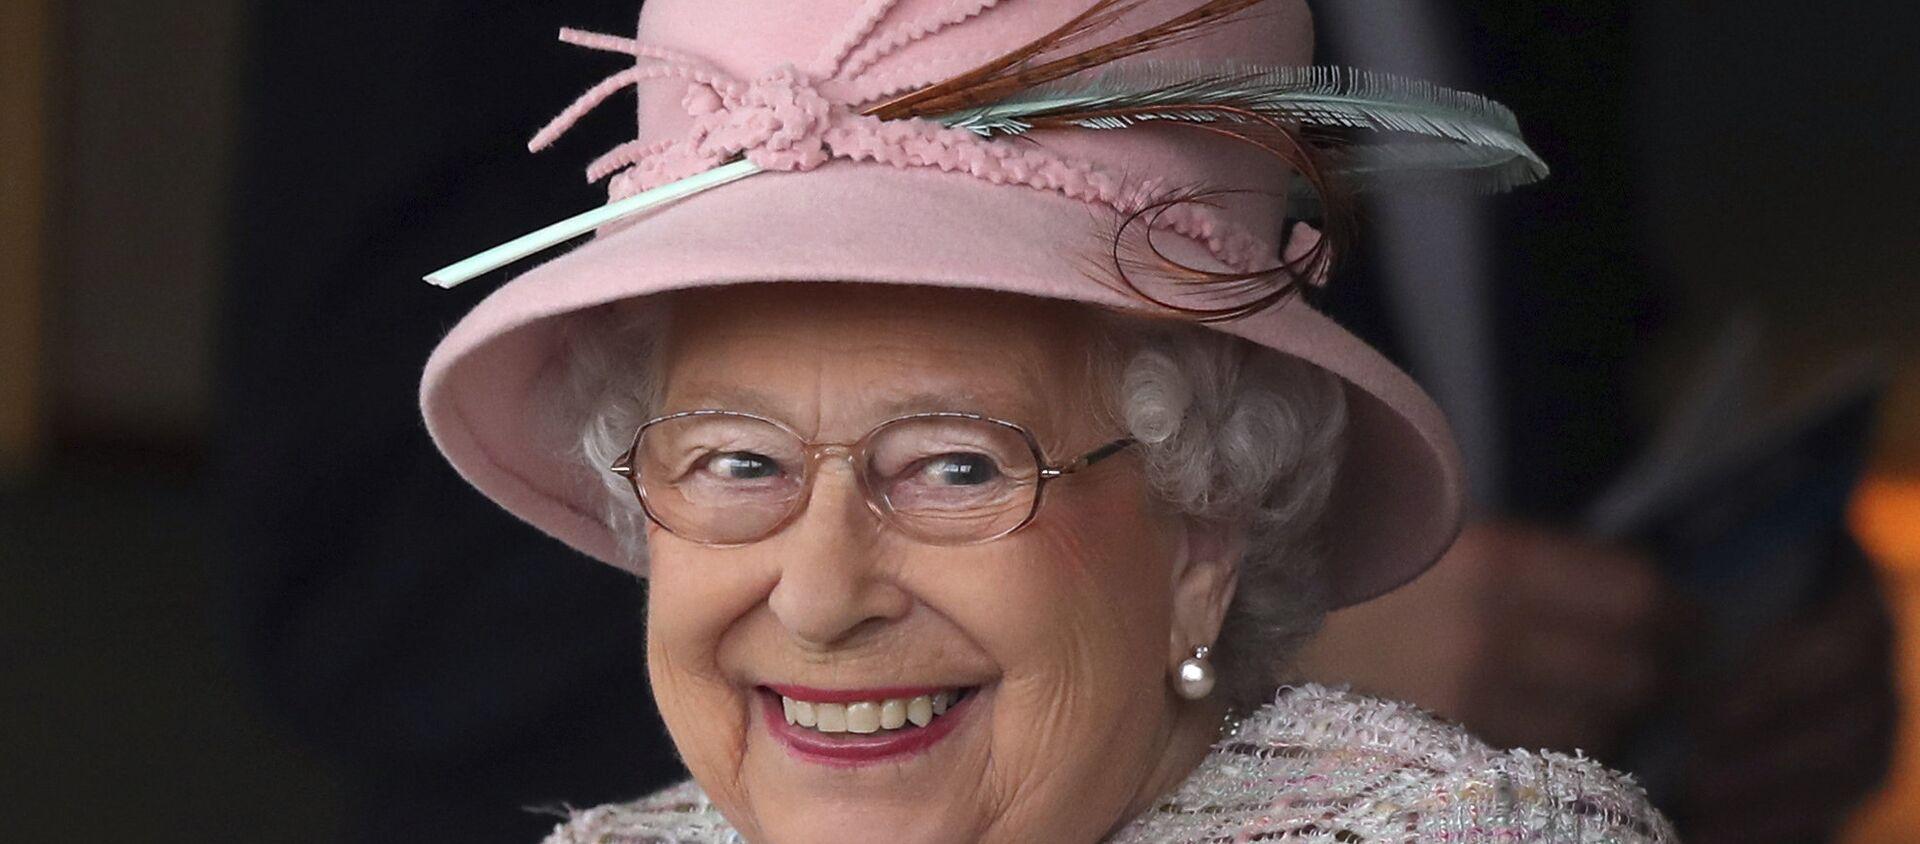 La regina del Regno Unito Elisabetta II - Sputnik Italia, 1920, 24.11.2020